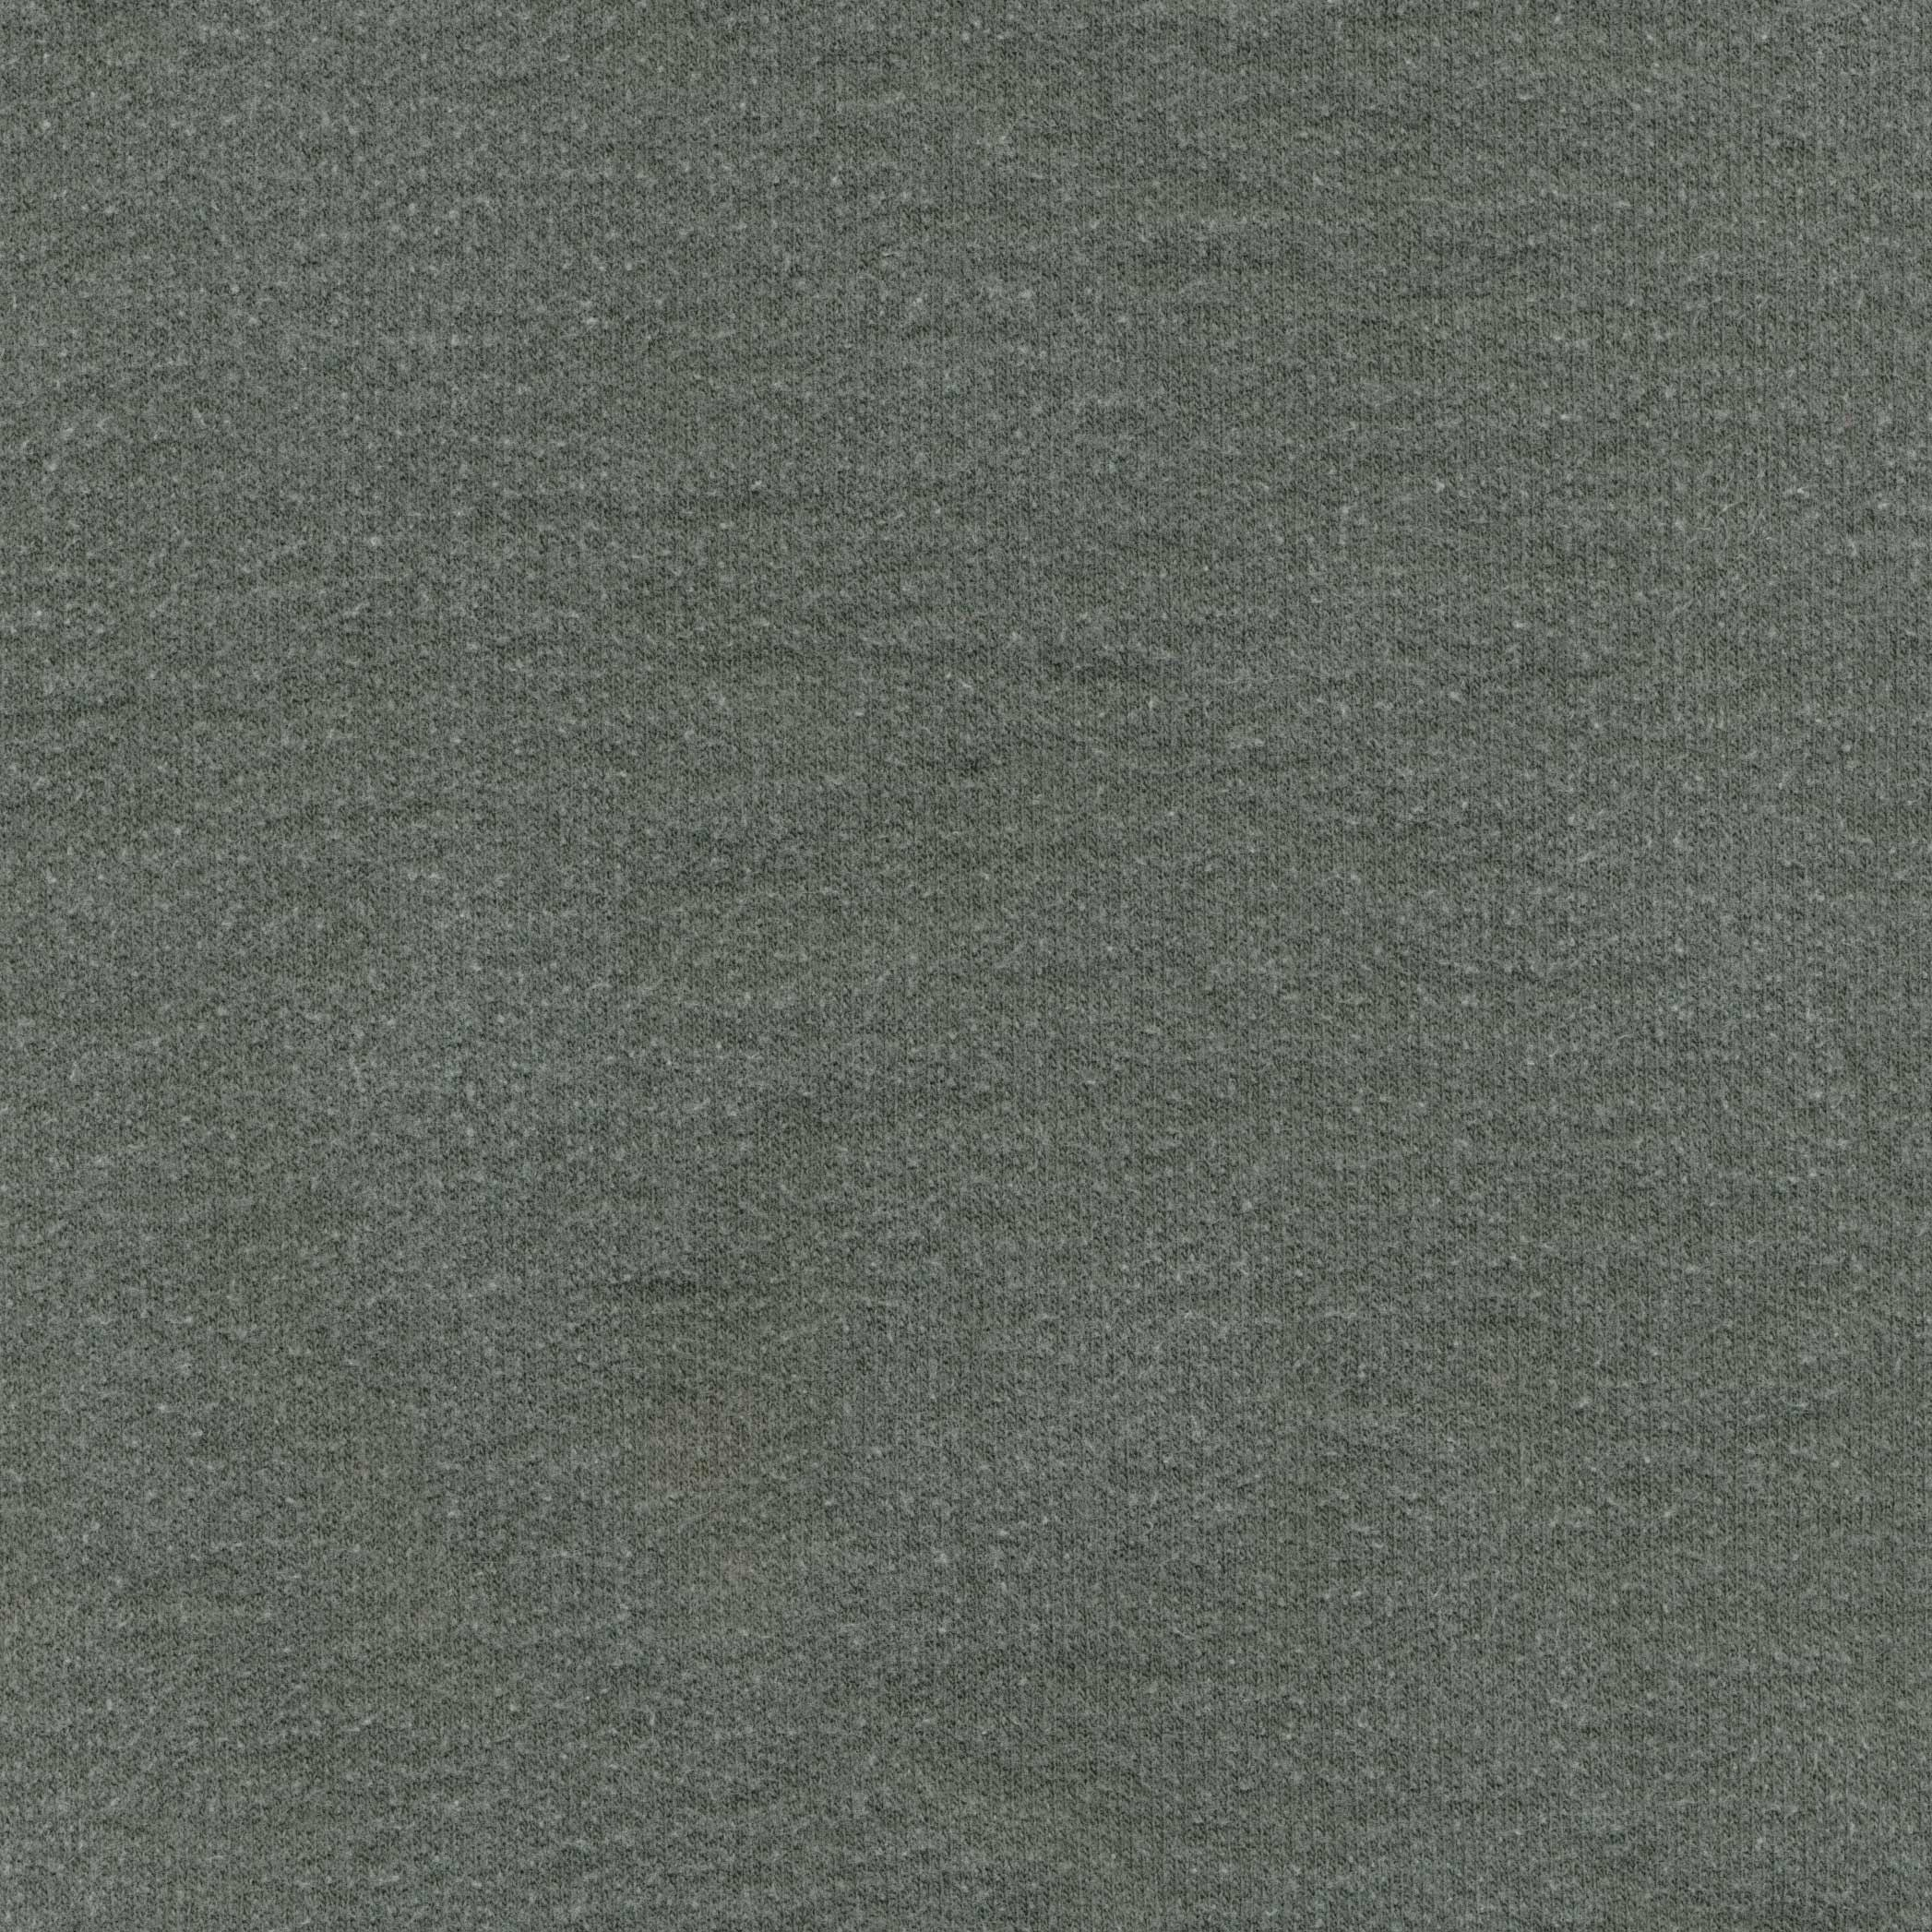 Knitting Texture Drawing : Wool knit by west ninja on deviantart